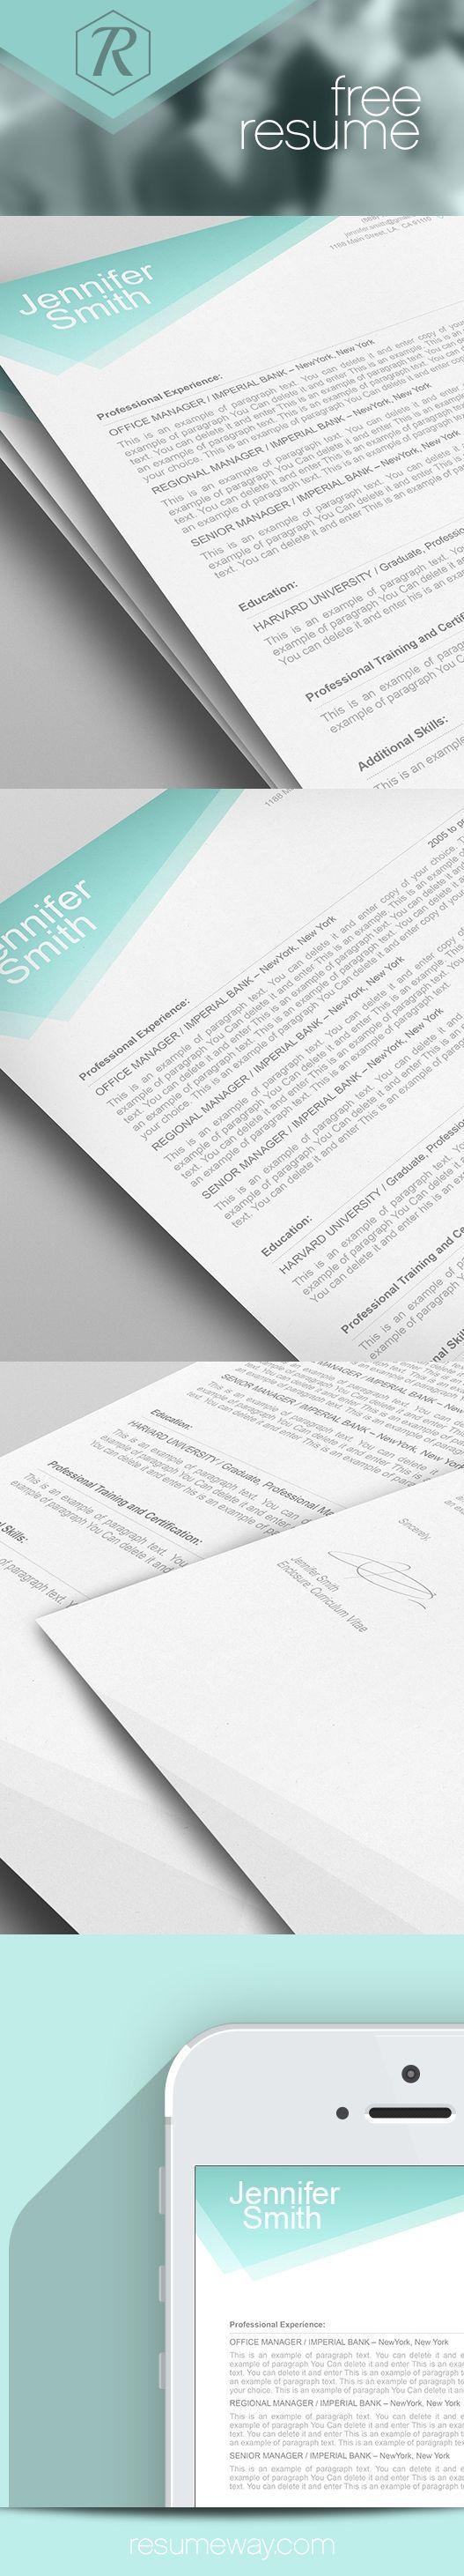 FREE Resume Template 1100020 Premium line